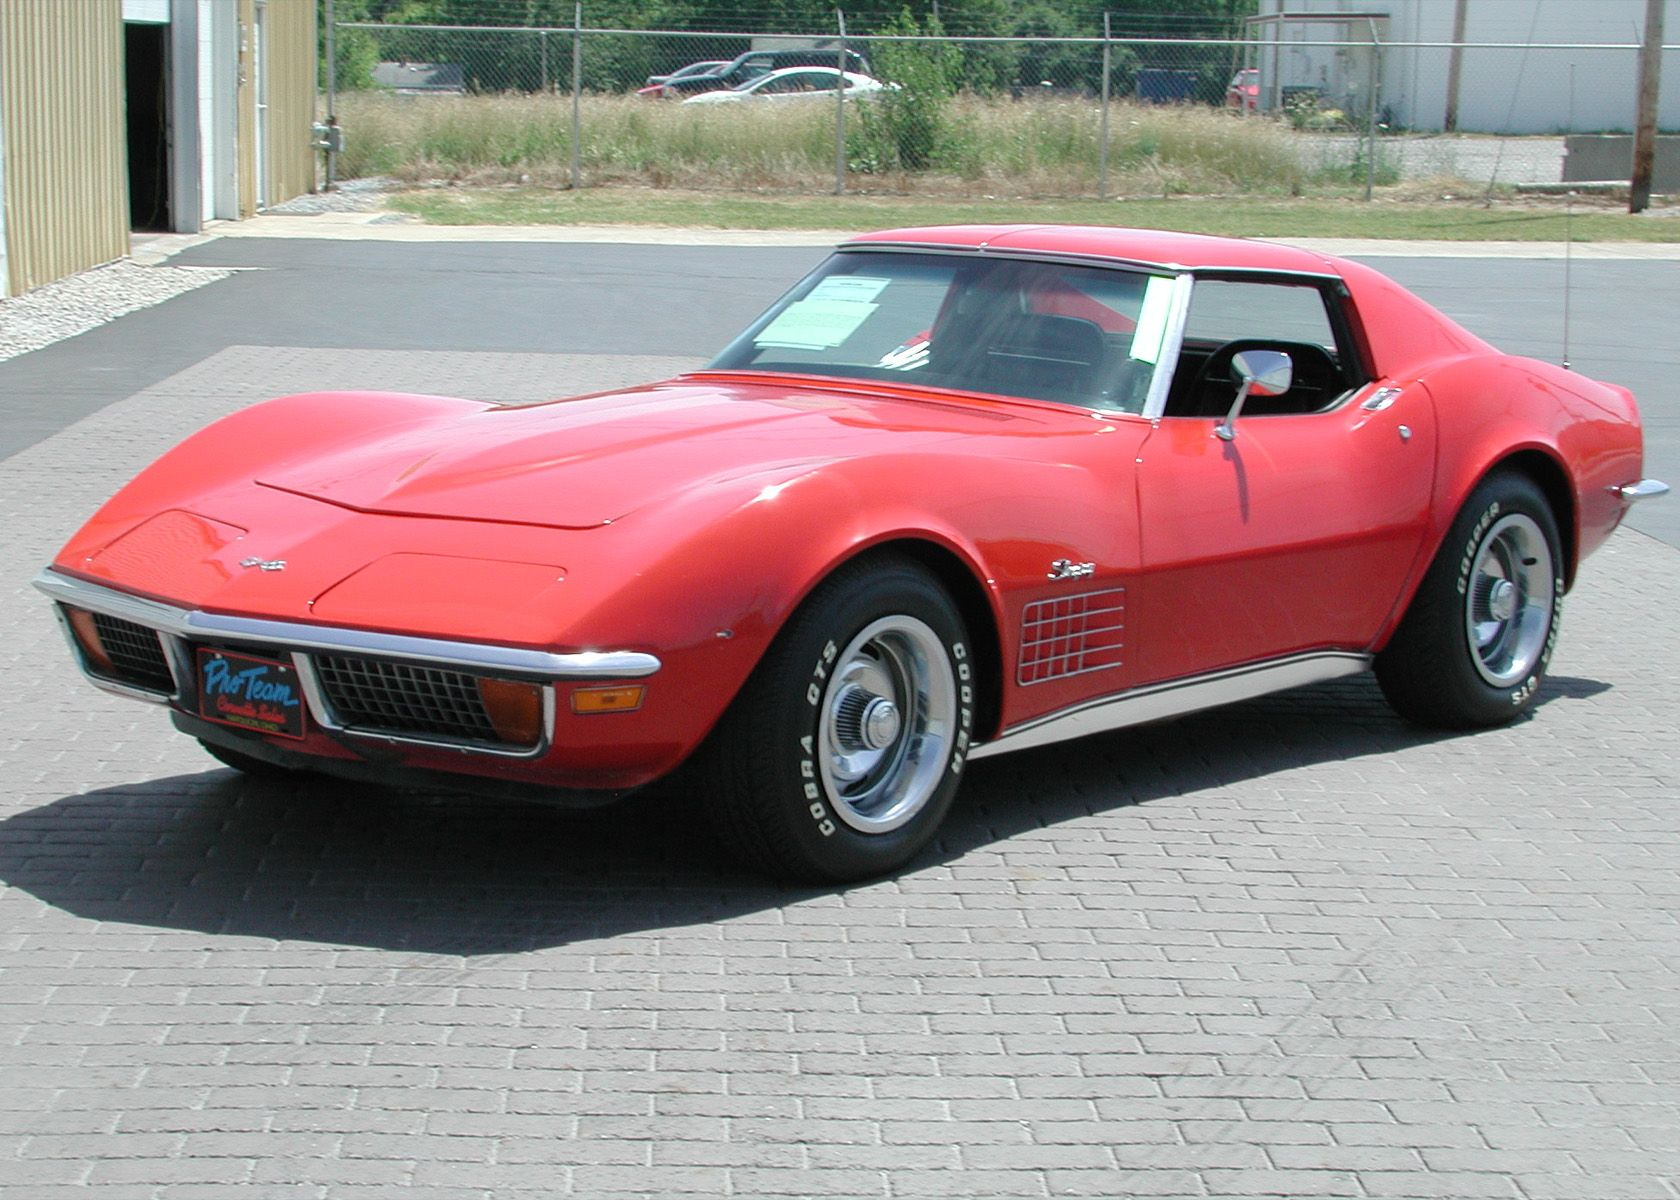 37++ Classic corvettes for sale near me inspiration